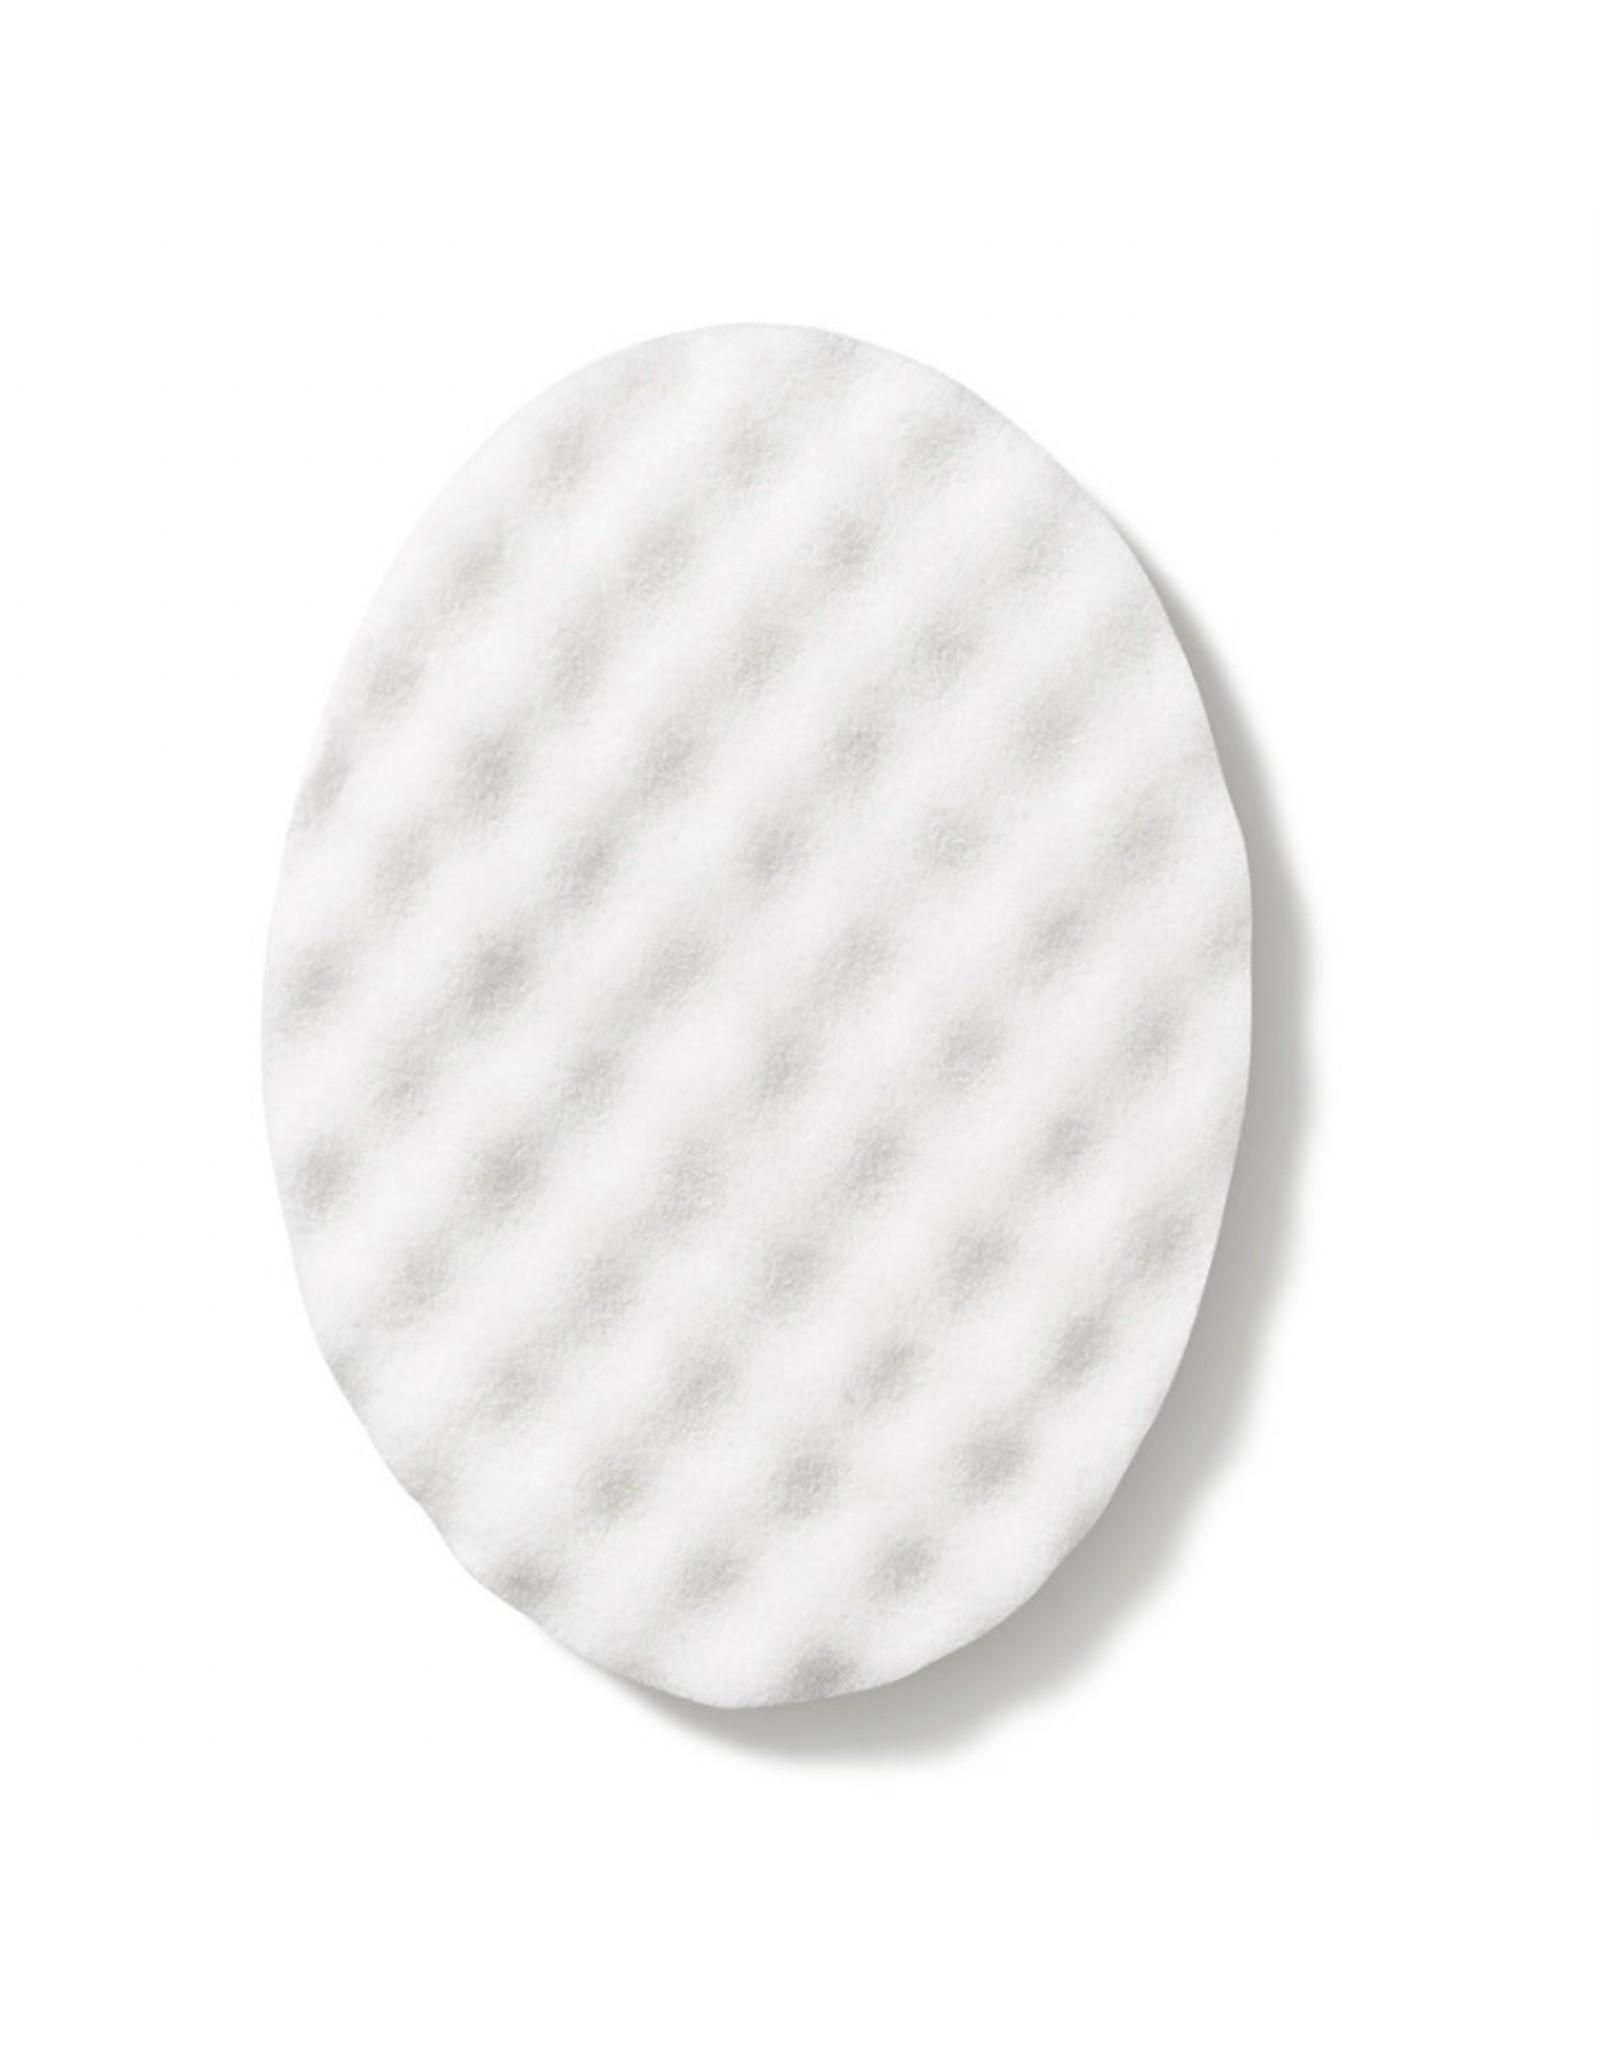 QMS Medicosmetics Cleansing Sponge